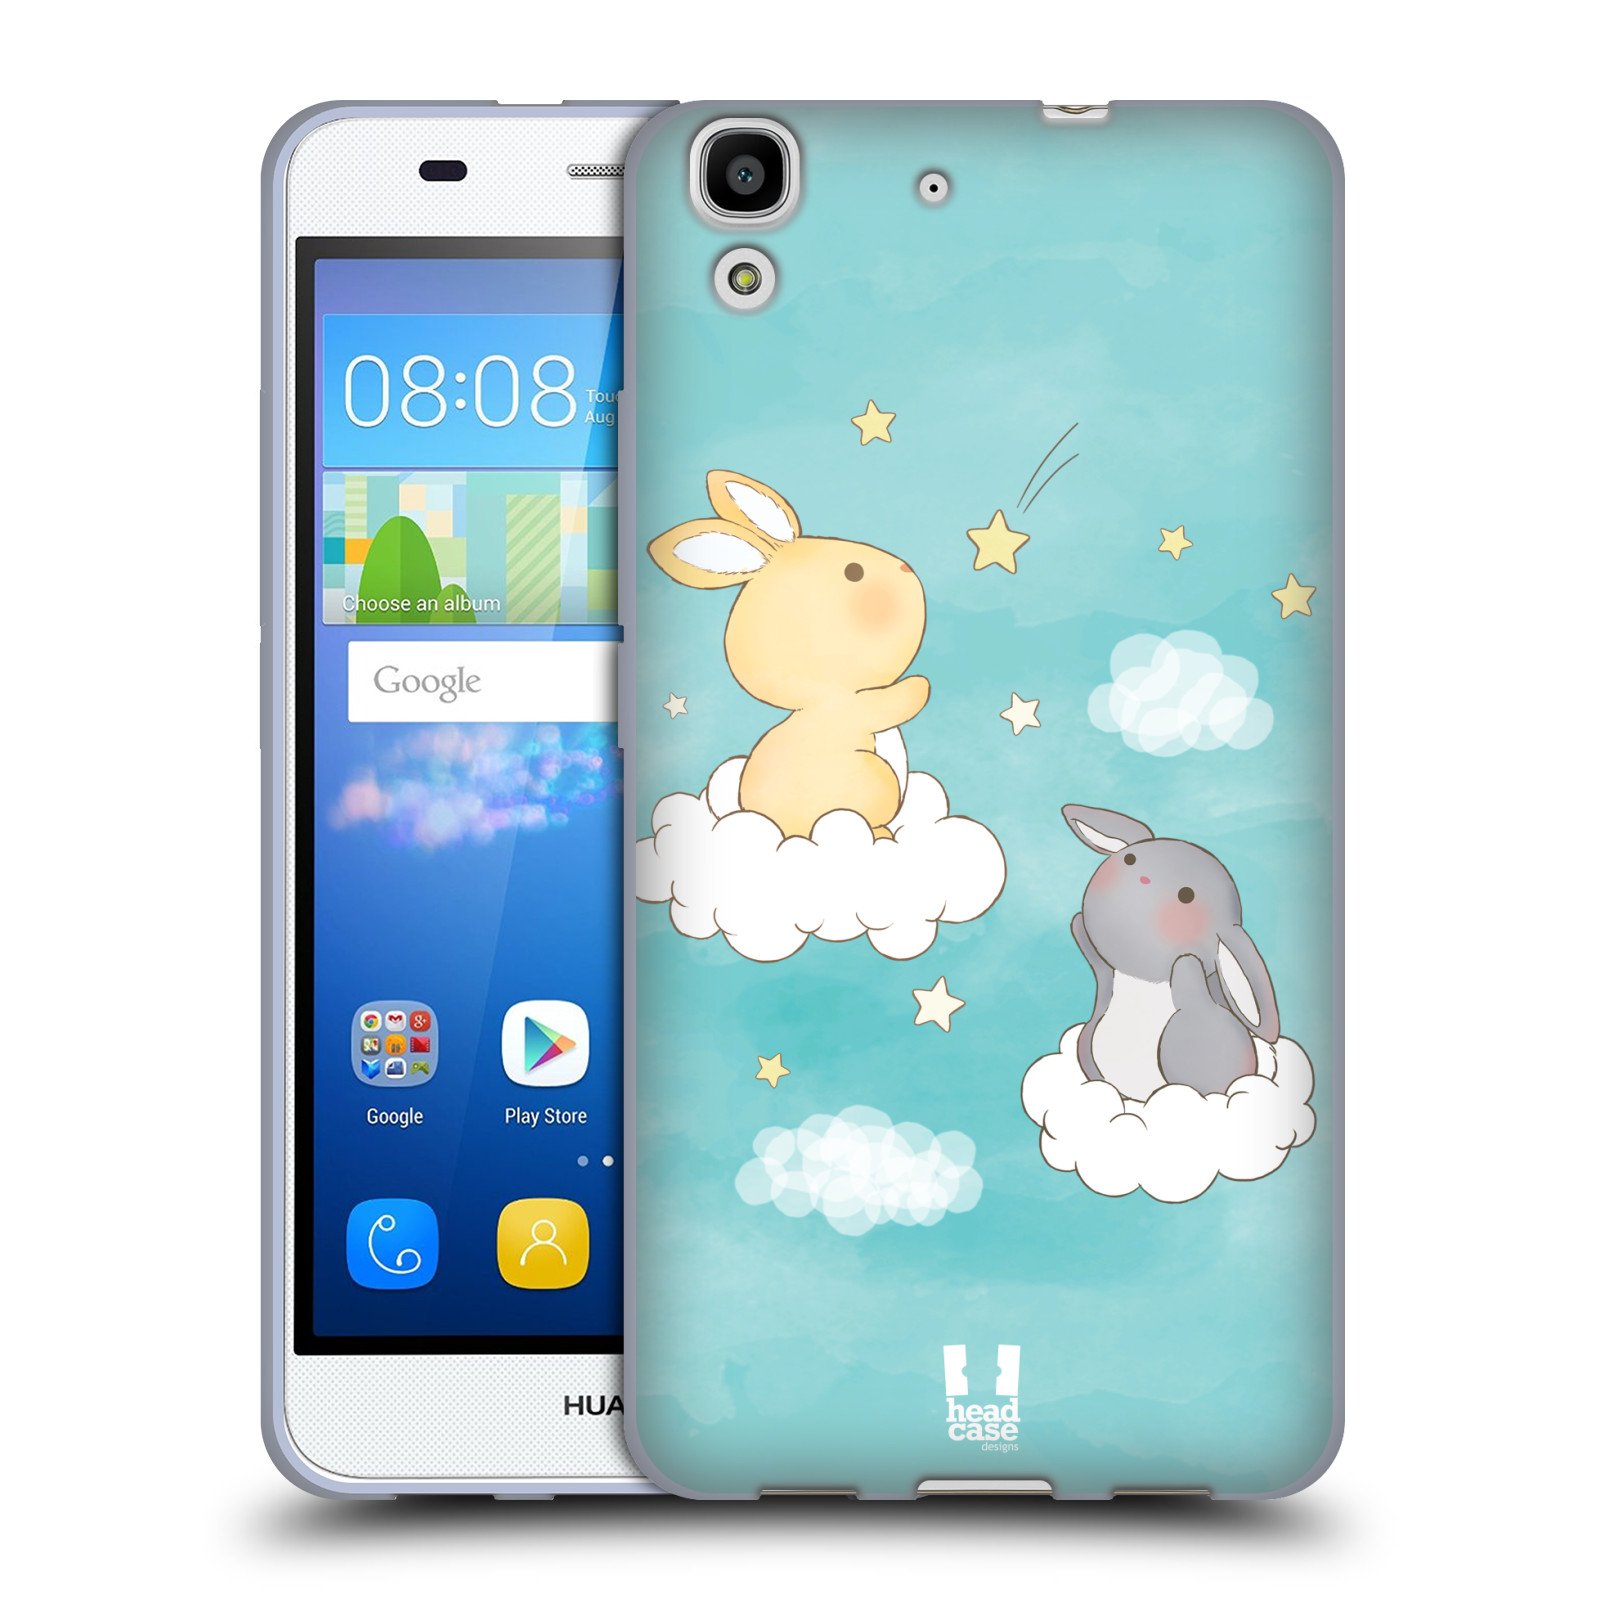 HEAD CASE silikonový obal na mobil HUAWEI Y6 vzor králíček a hvězdy modrá